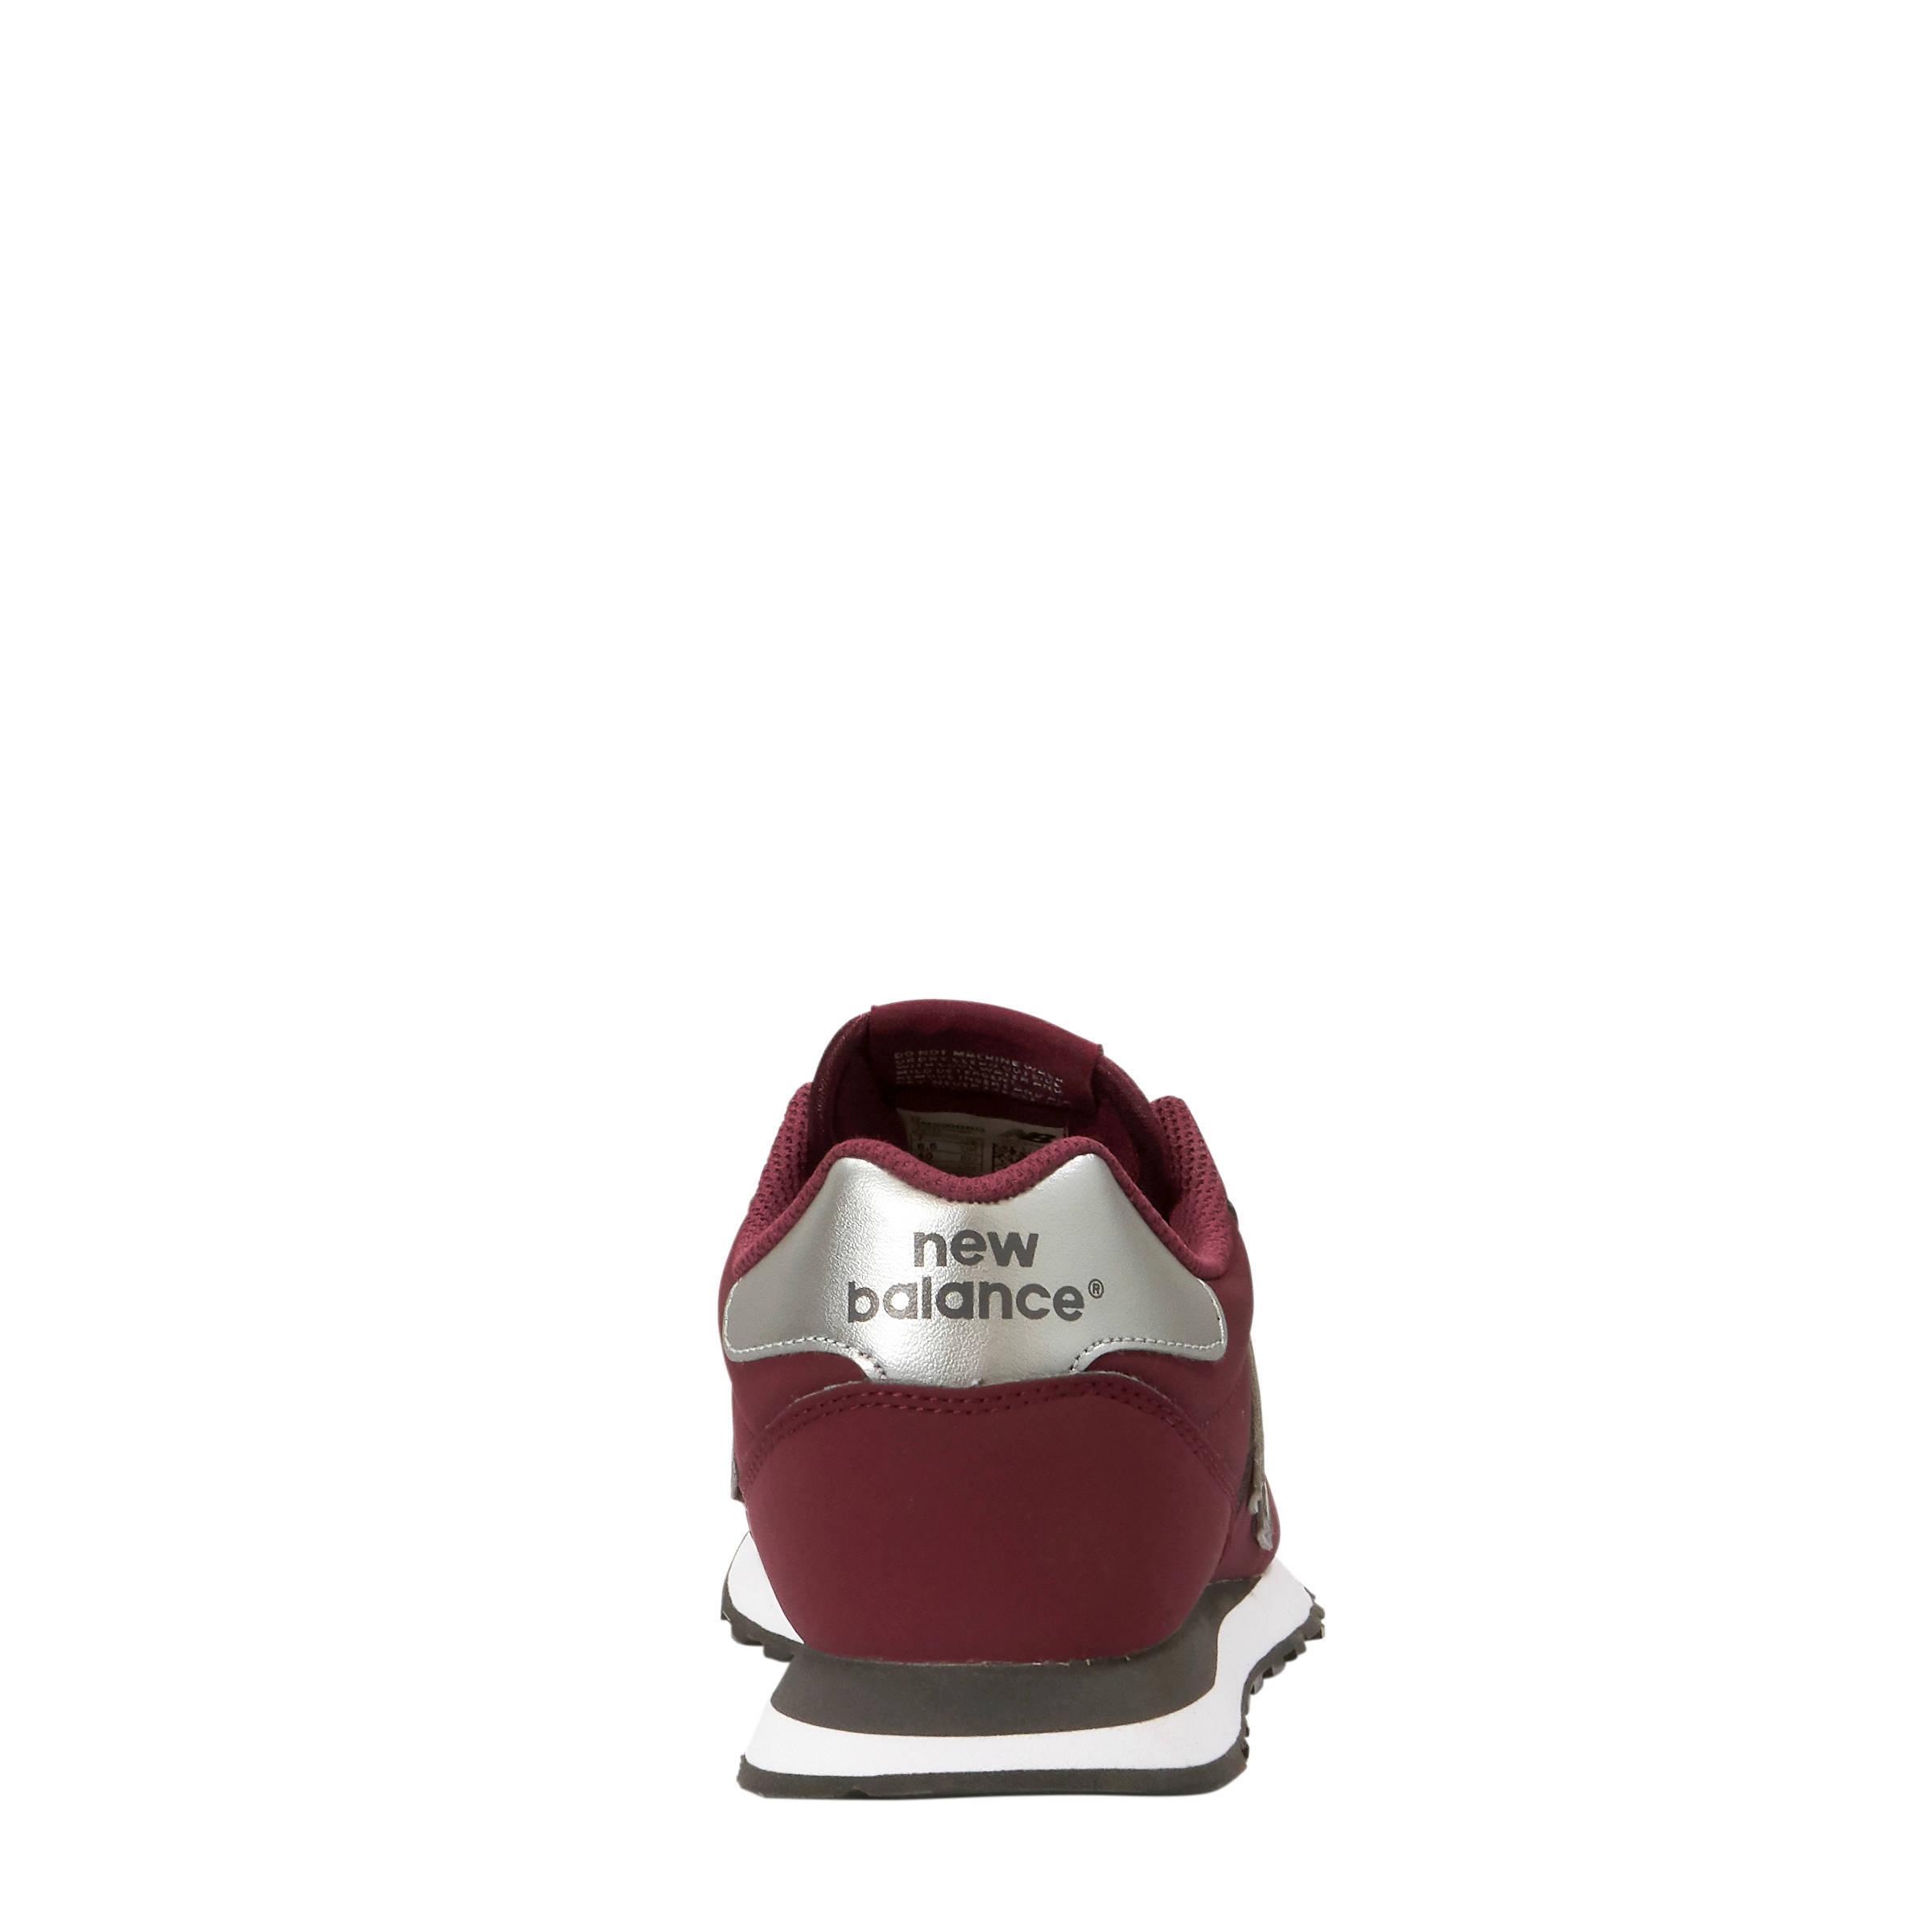 c4305572957 New Balance GM500 sneakers donkerrood   wehkamp